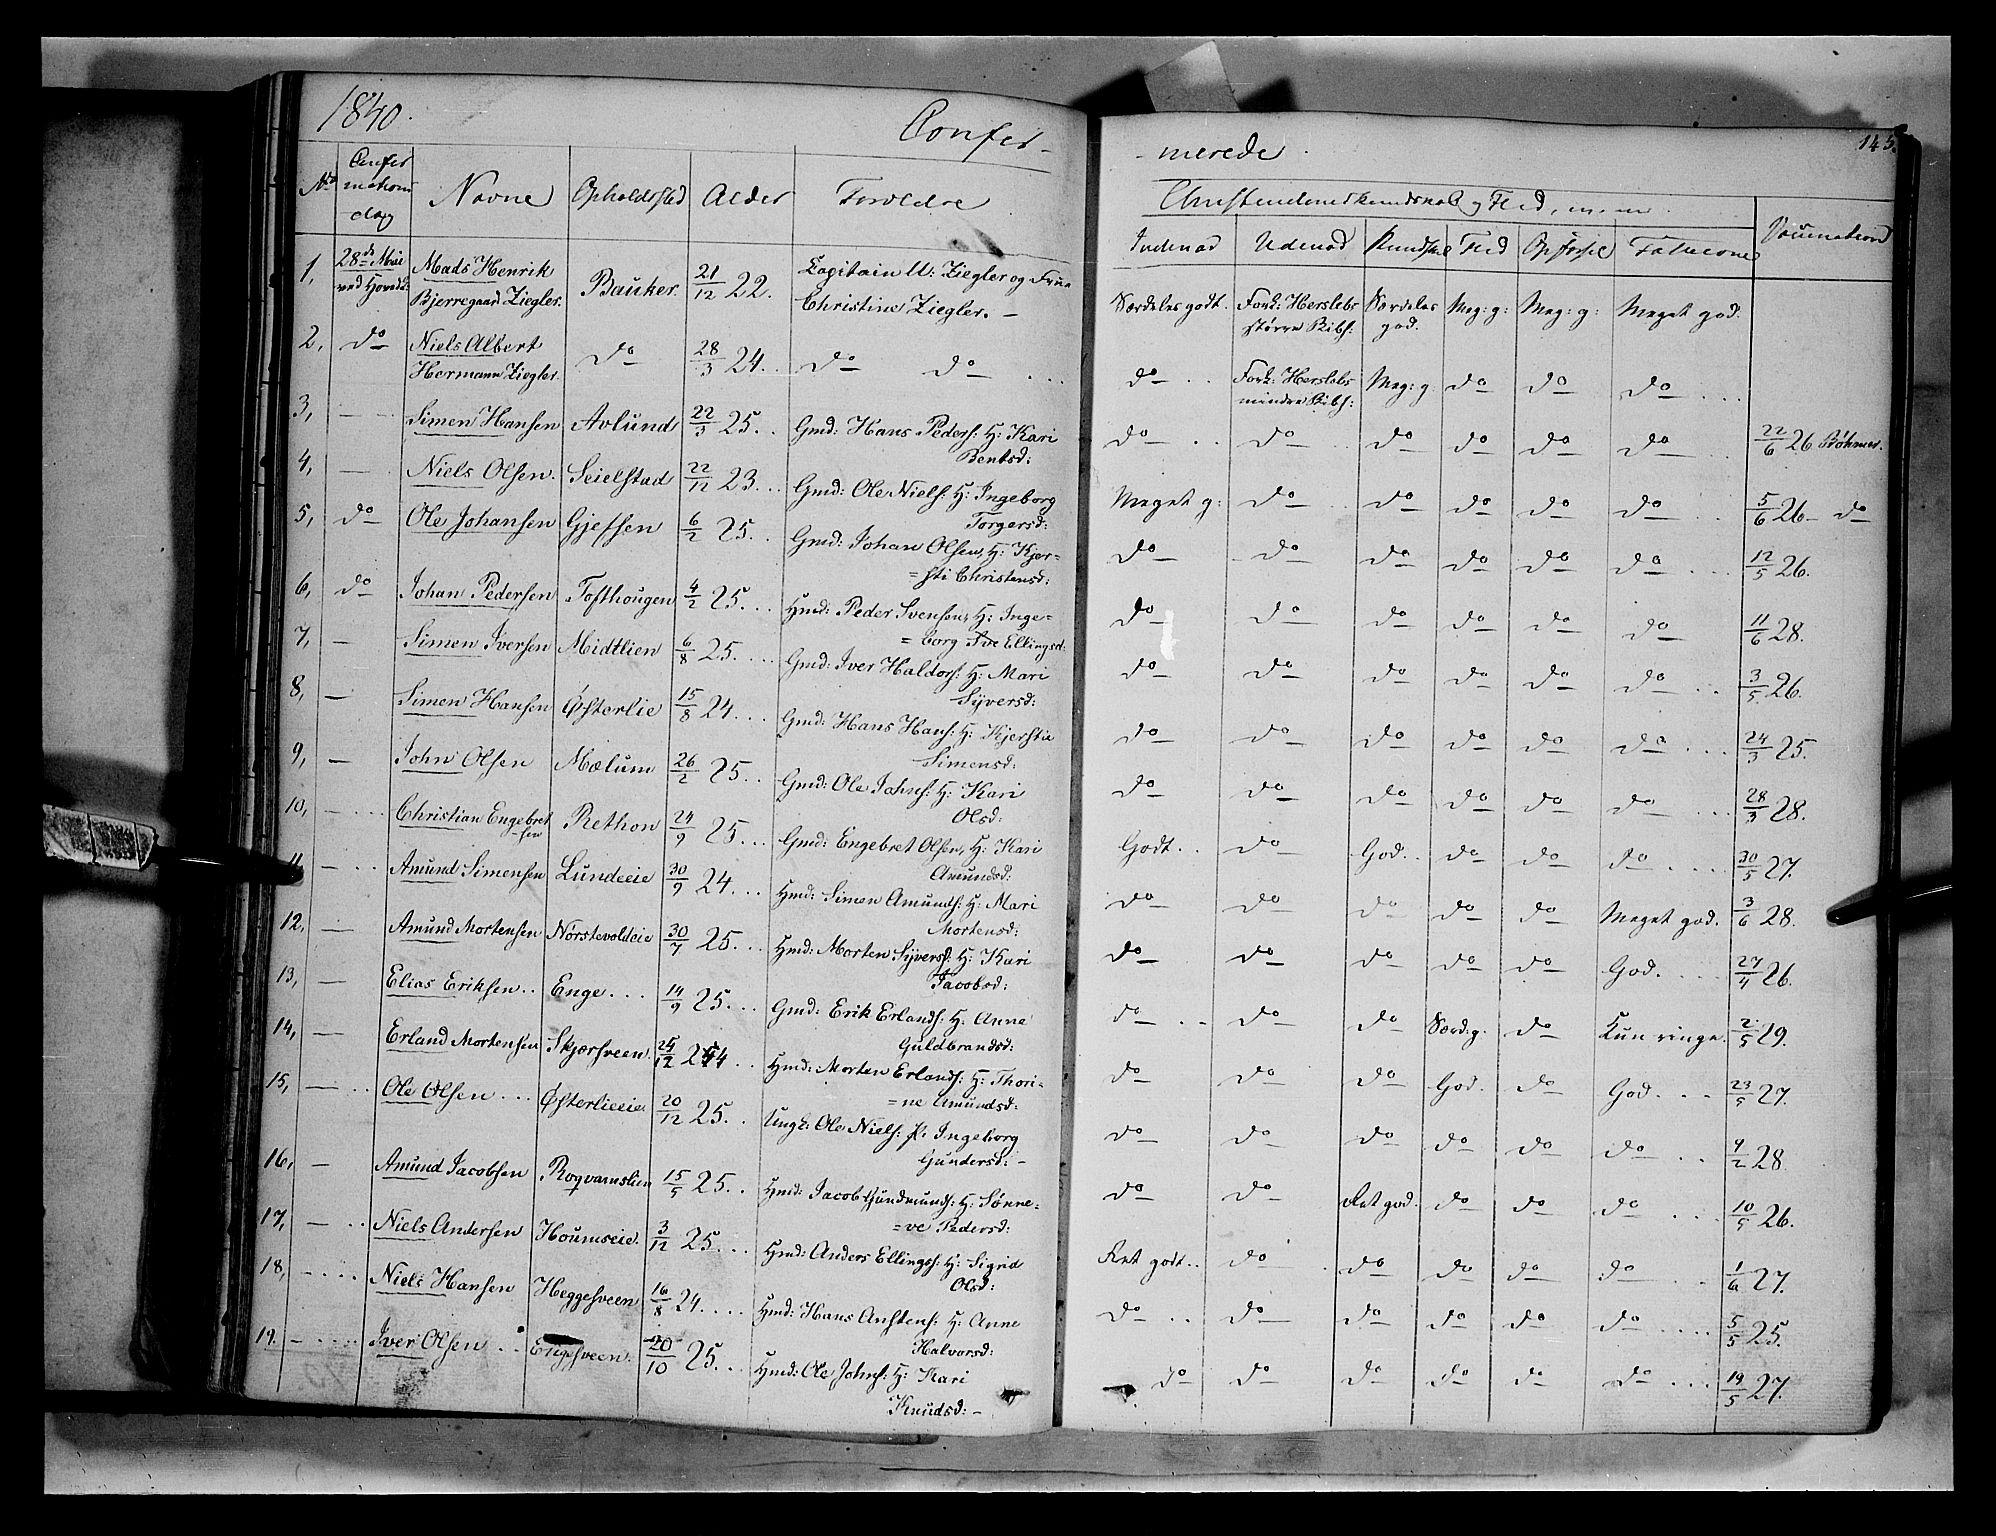 SAH, Gausdal prestekontor, Ministerialbok nr. 7, 1840-1850, s. 145